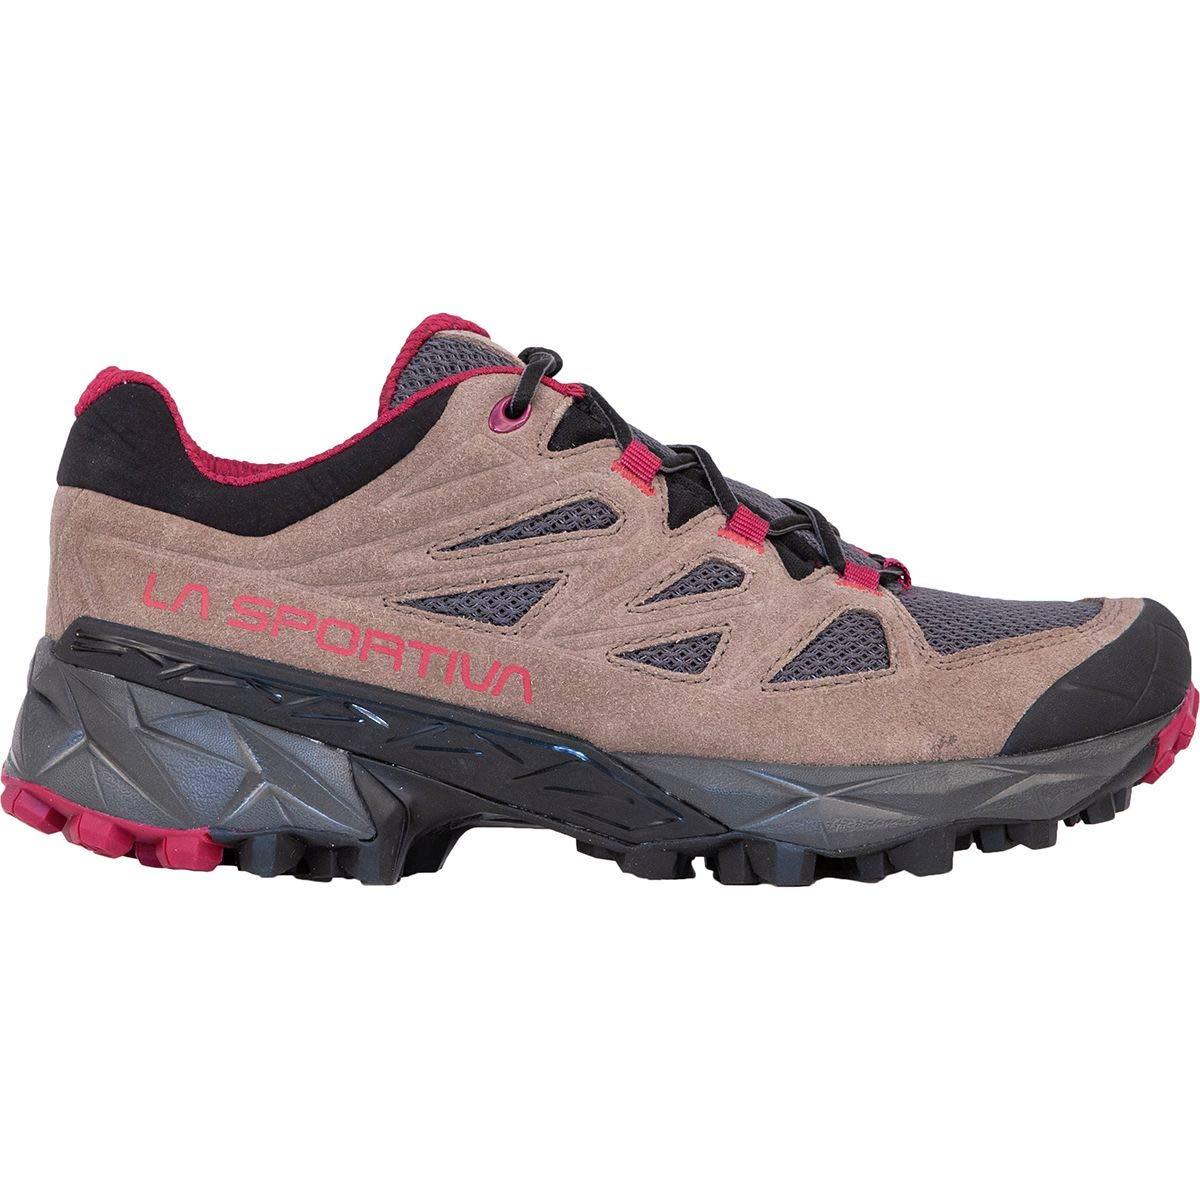 Taupe   Beet La Sportiva Trail Ridge Low Women's Hiking shoes